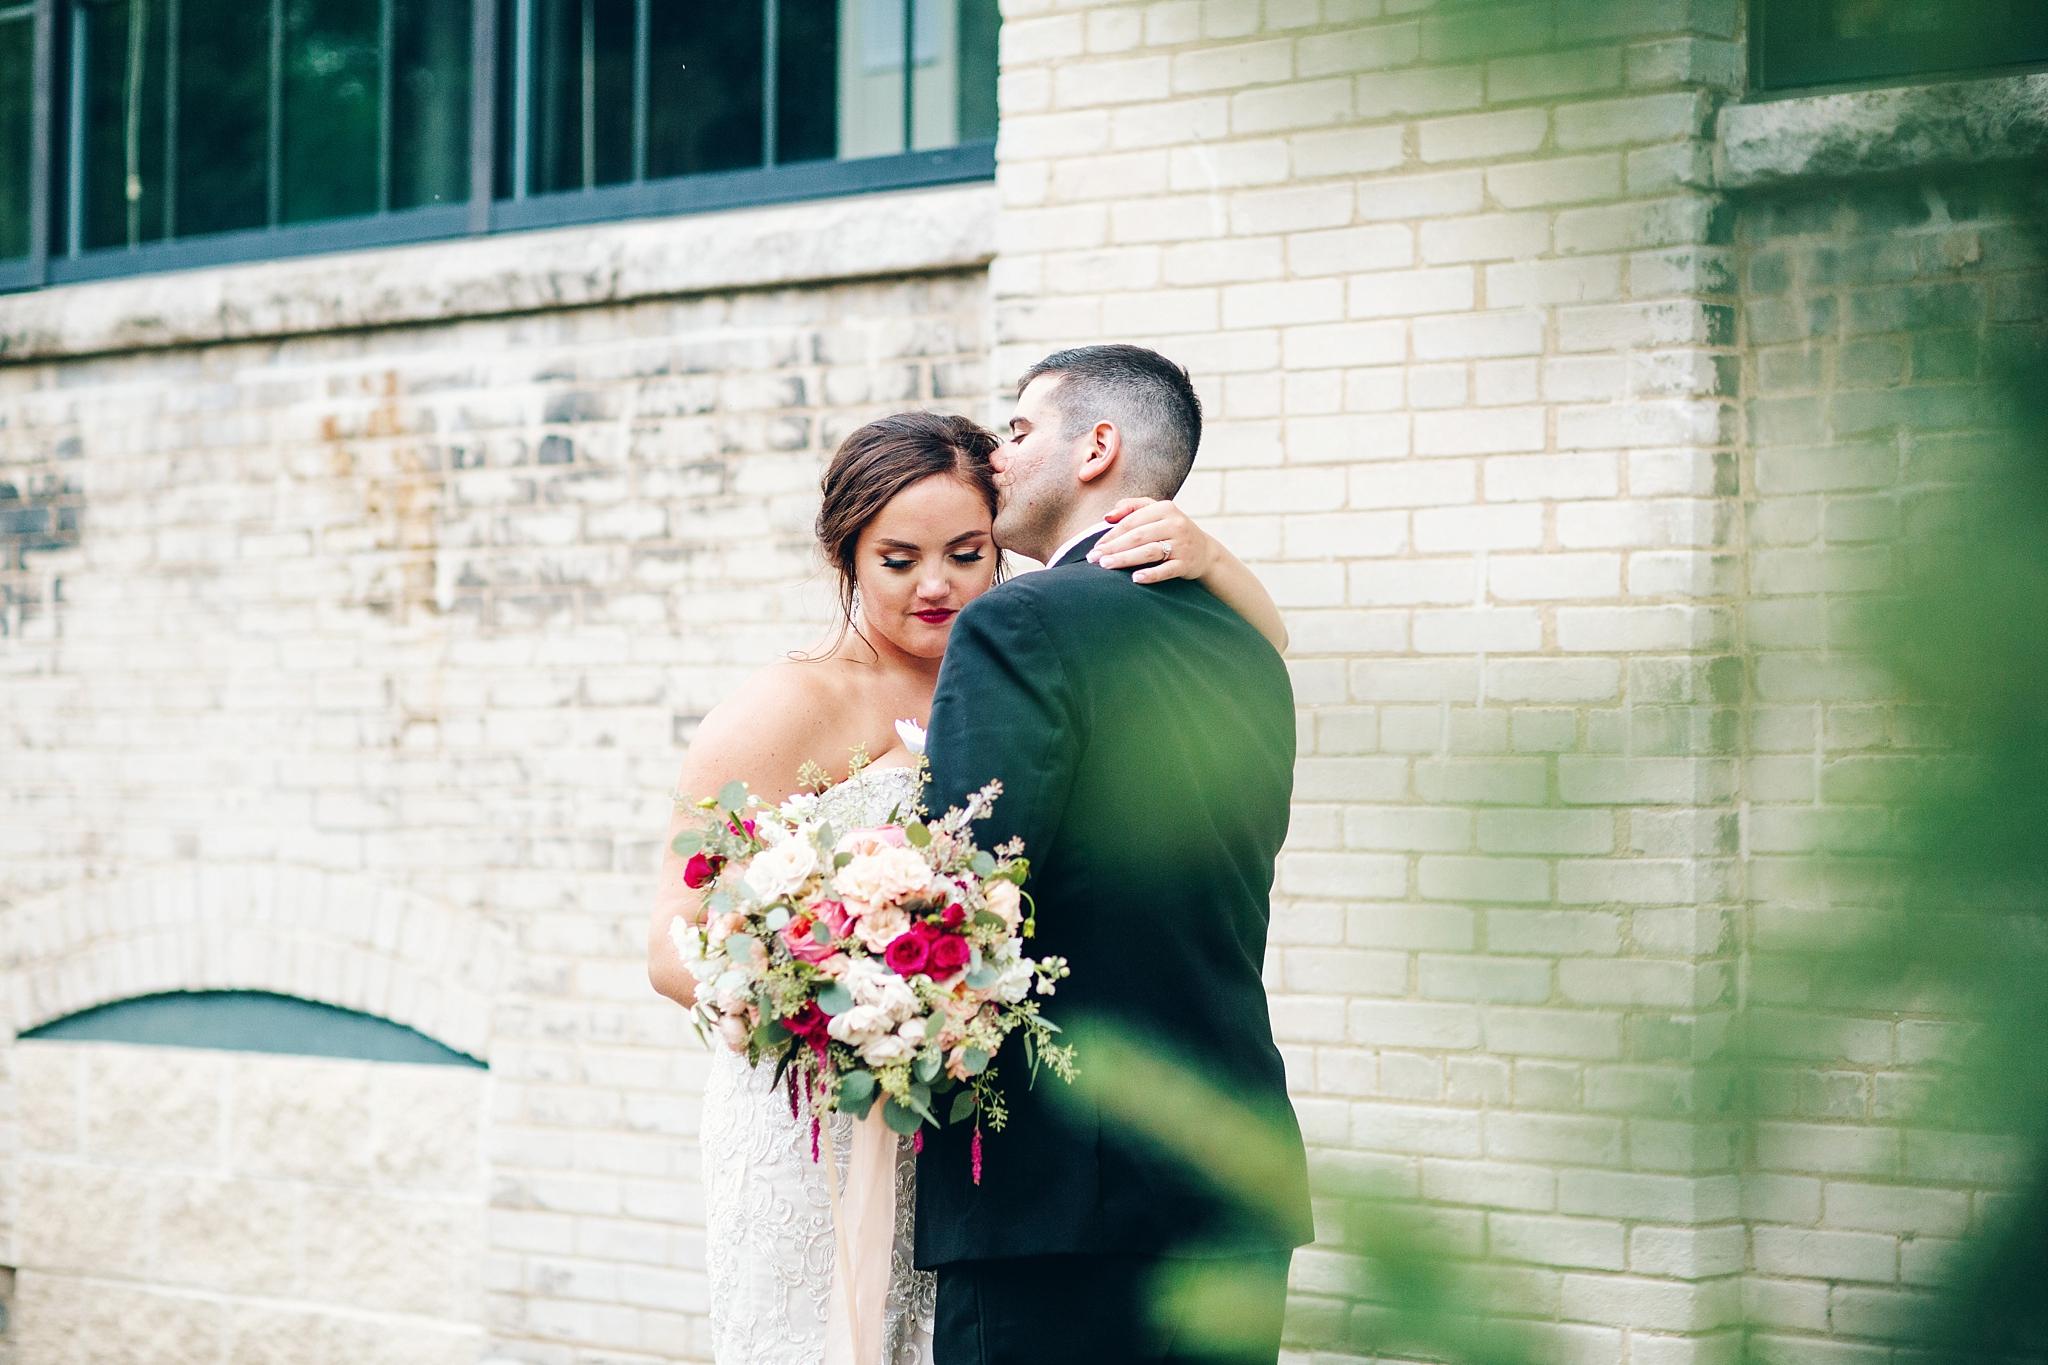 baker-lofts-holland-michigan-wedding-photographer_0415.jpg